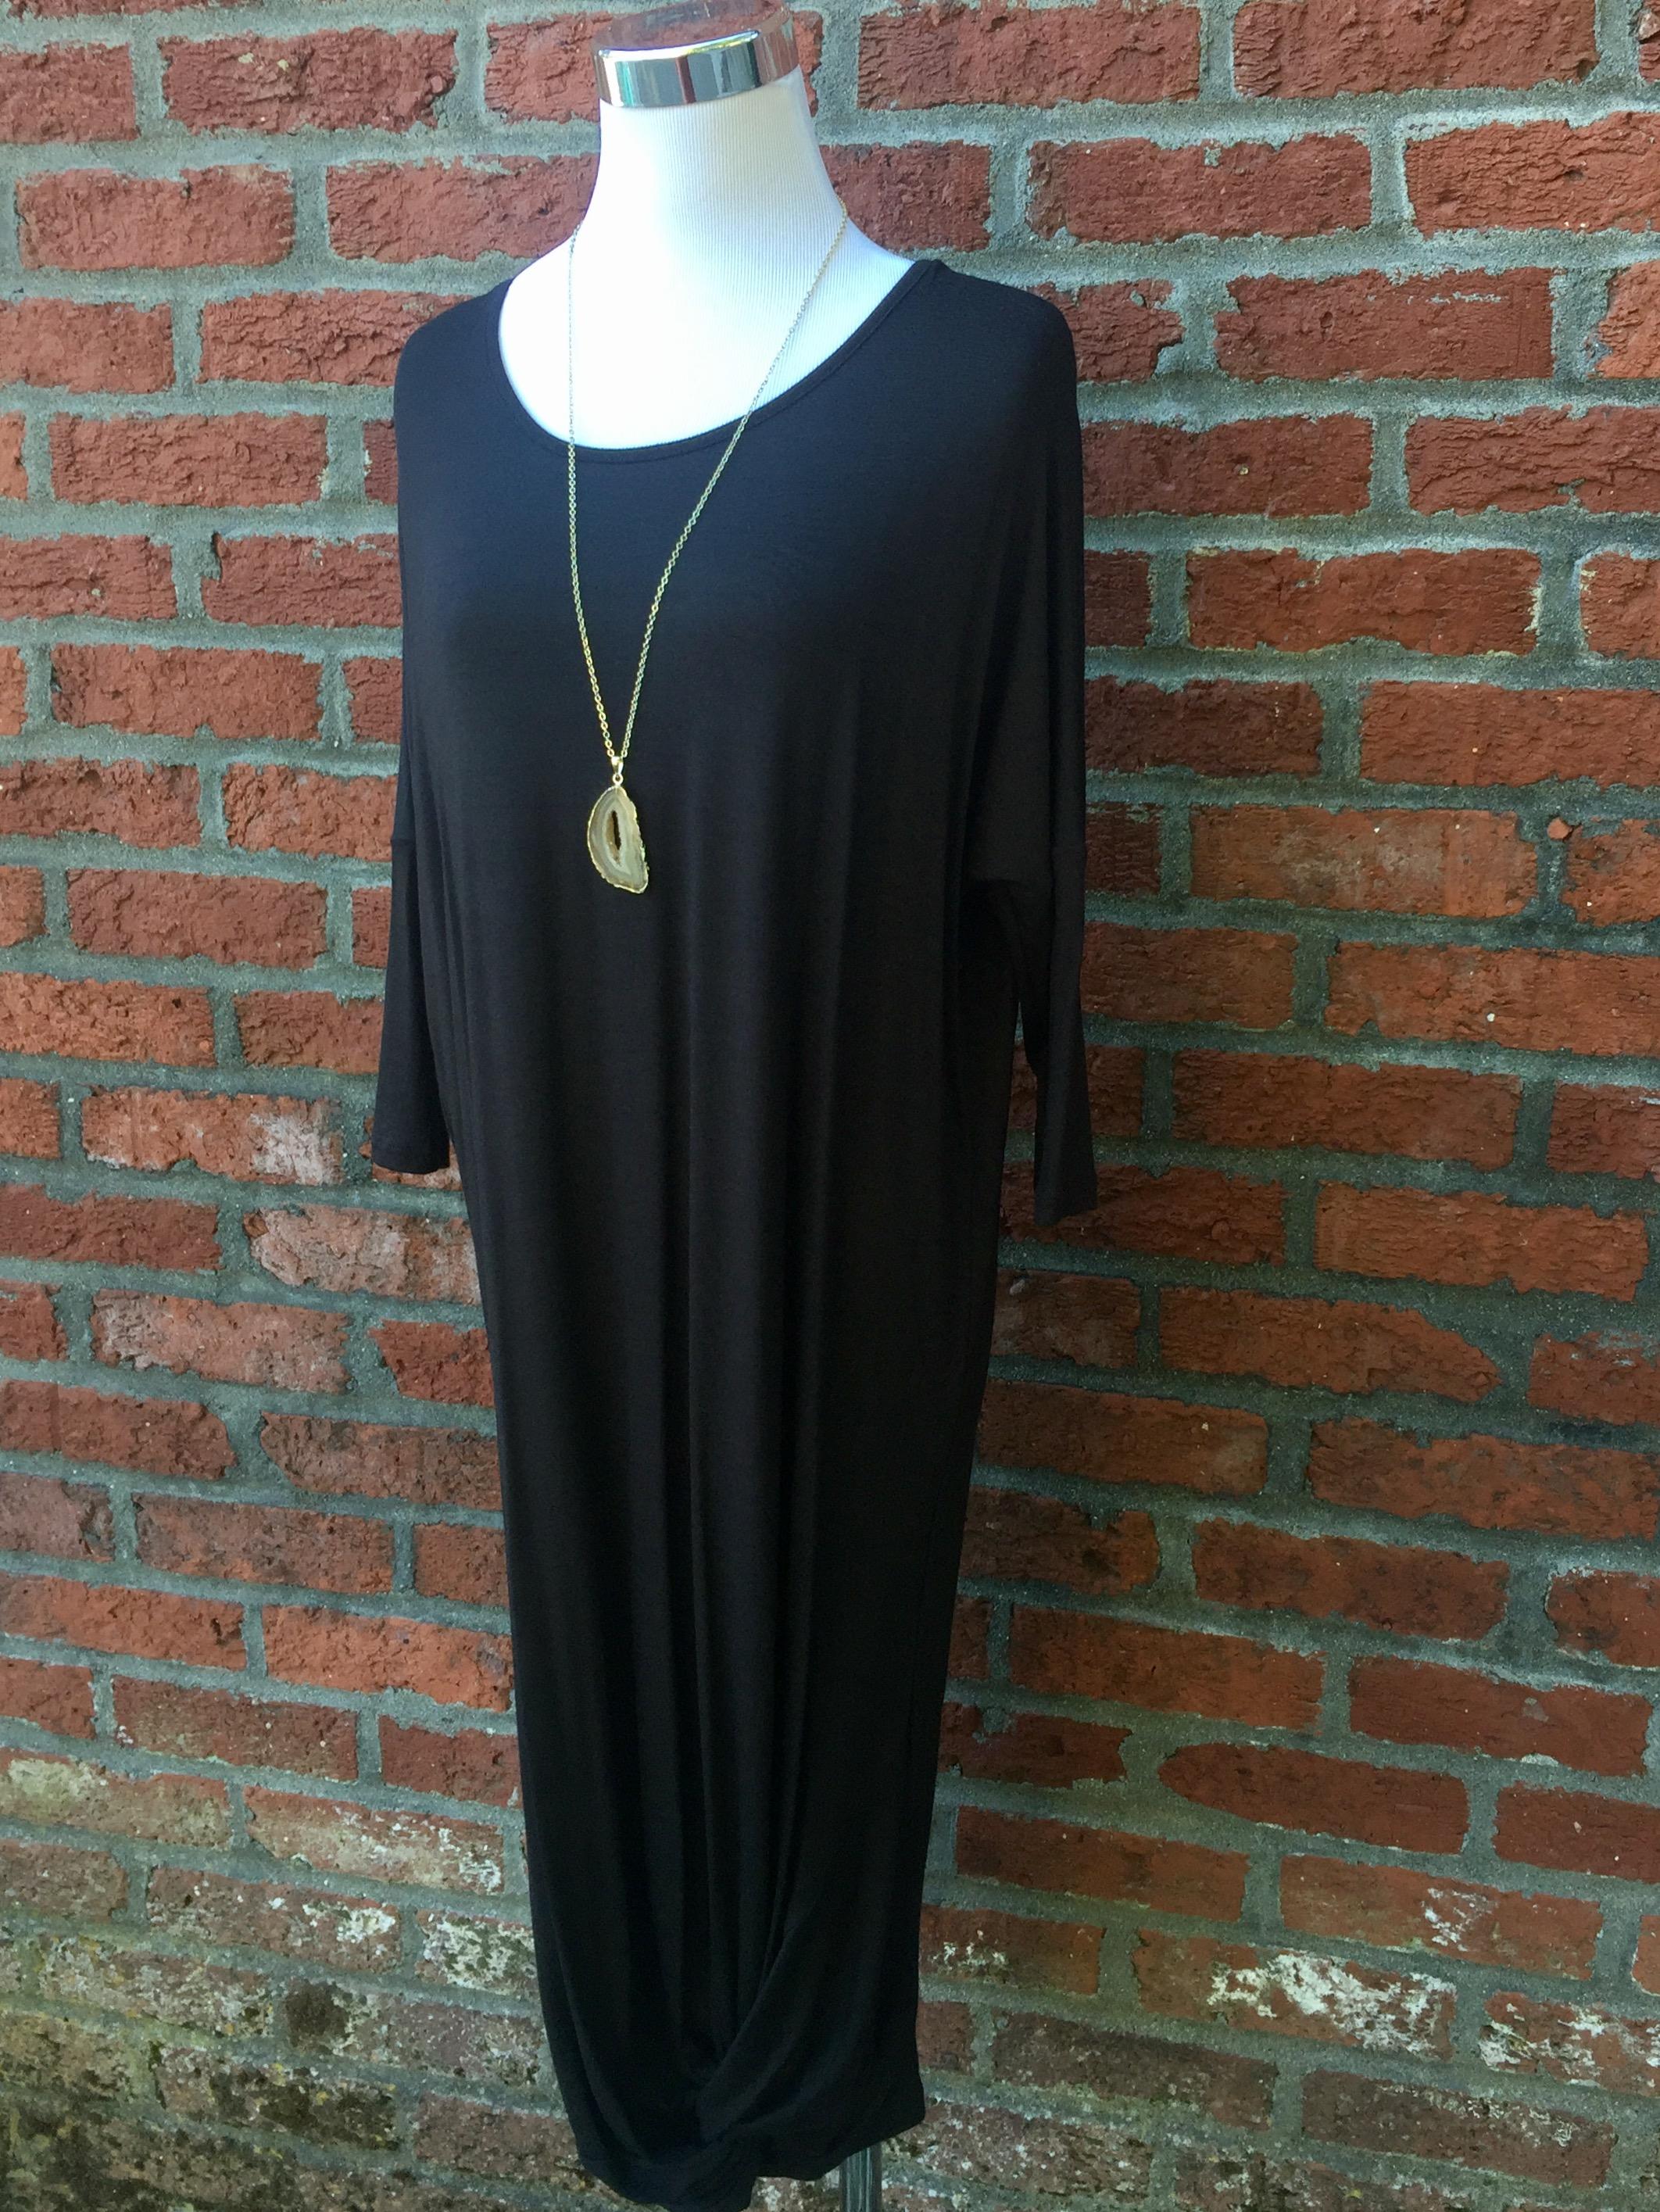 Twisted Midi Dress (Burgundy and Black, $35)